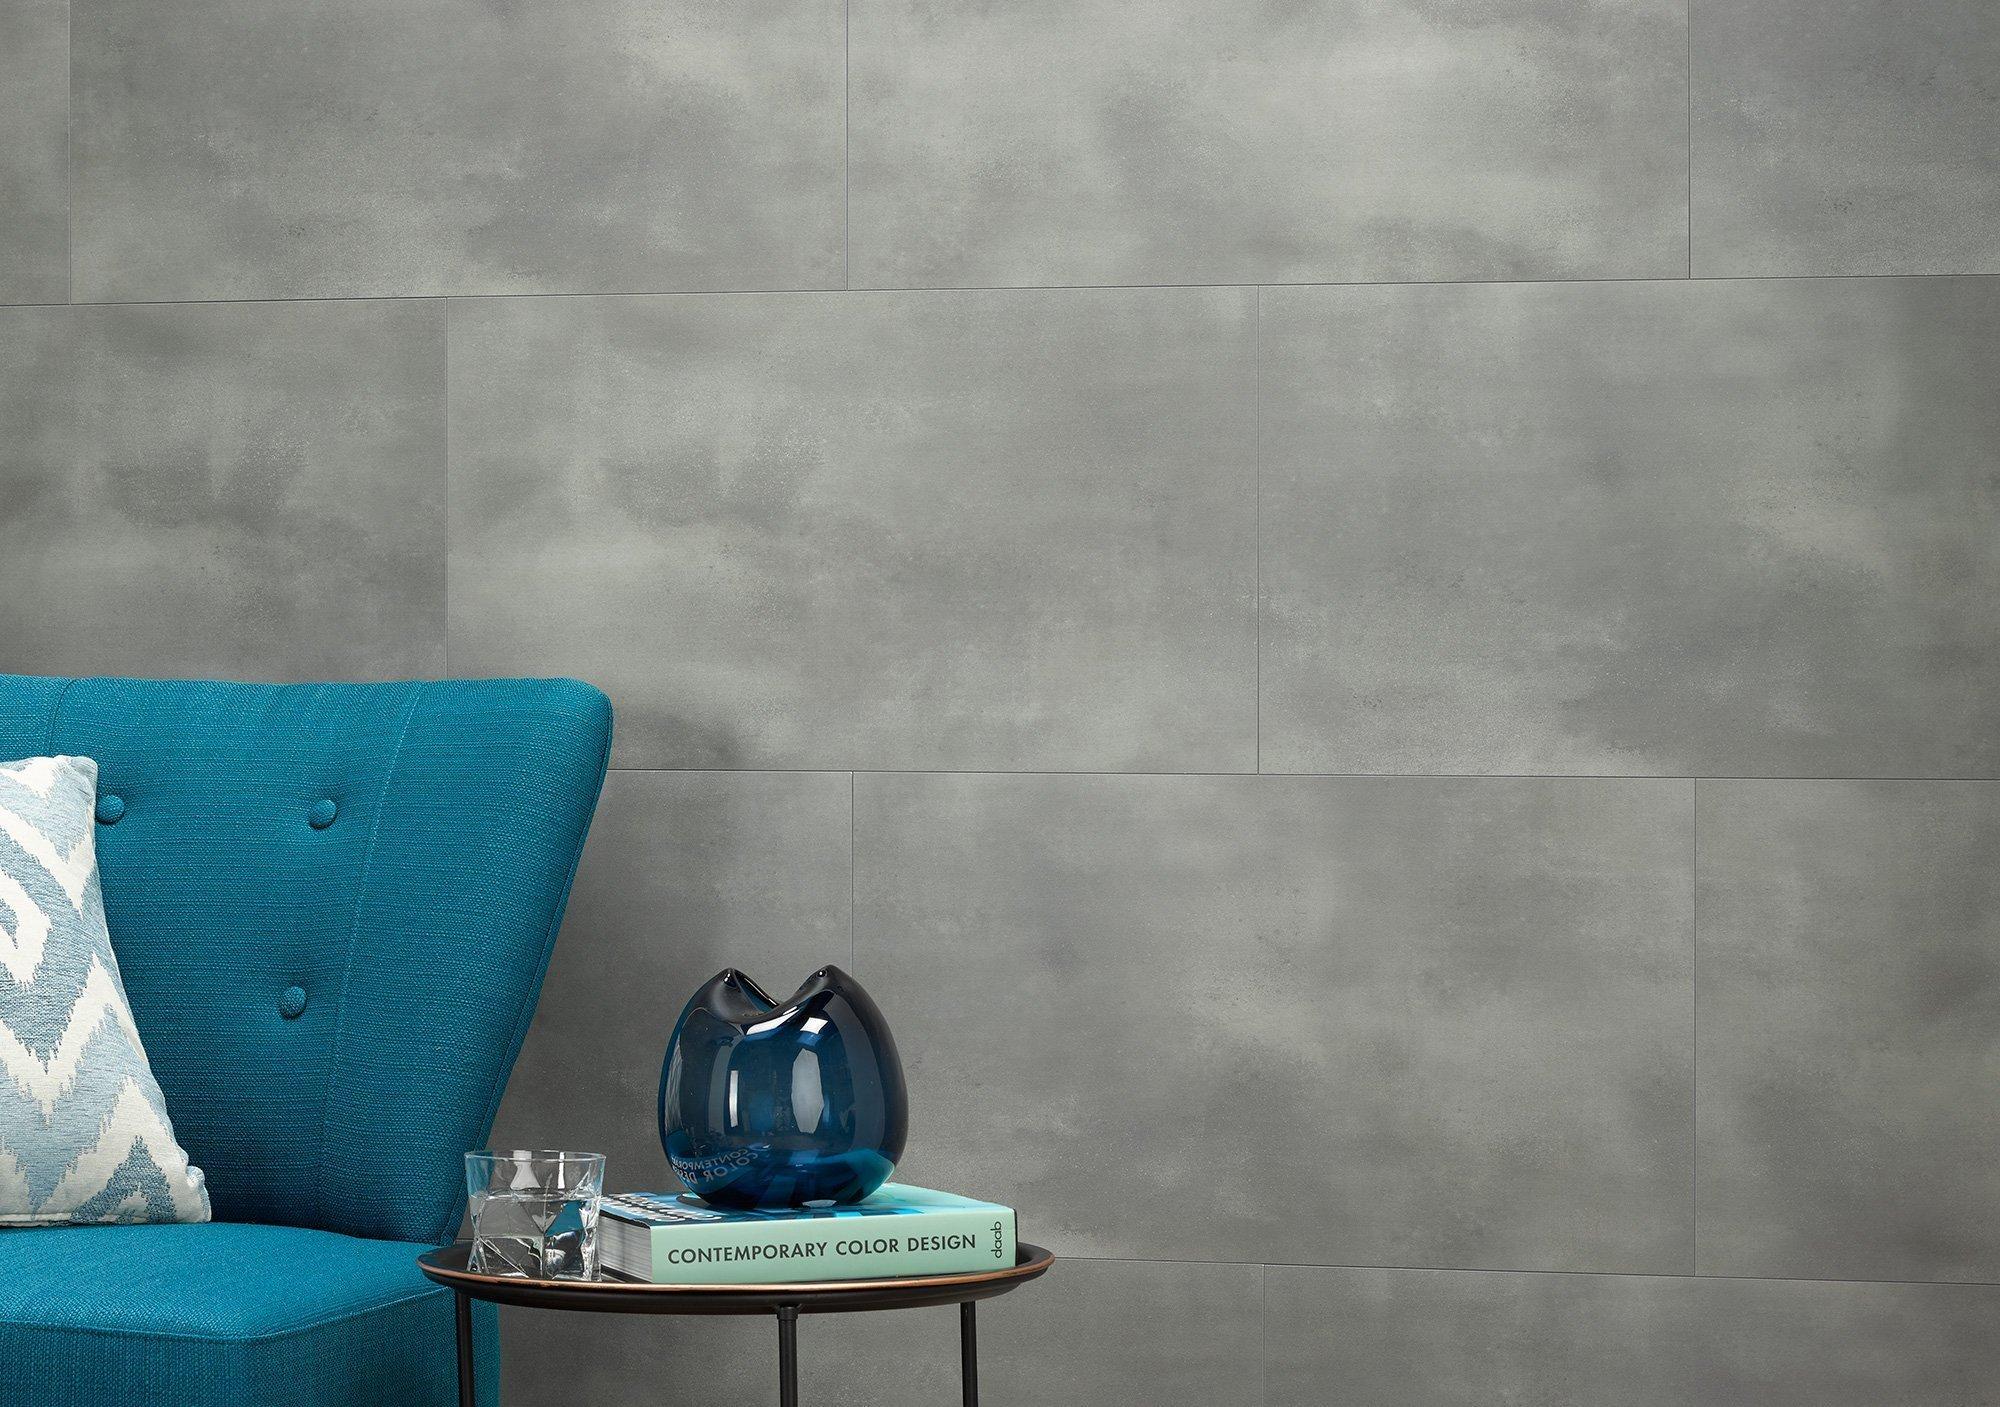 Dumawall Salle De Bain dumawall plus tile effect cladding | bathroom cladding direct